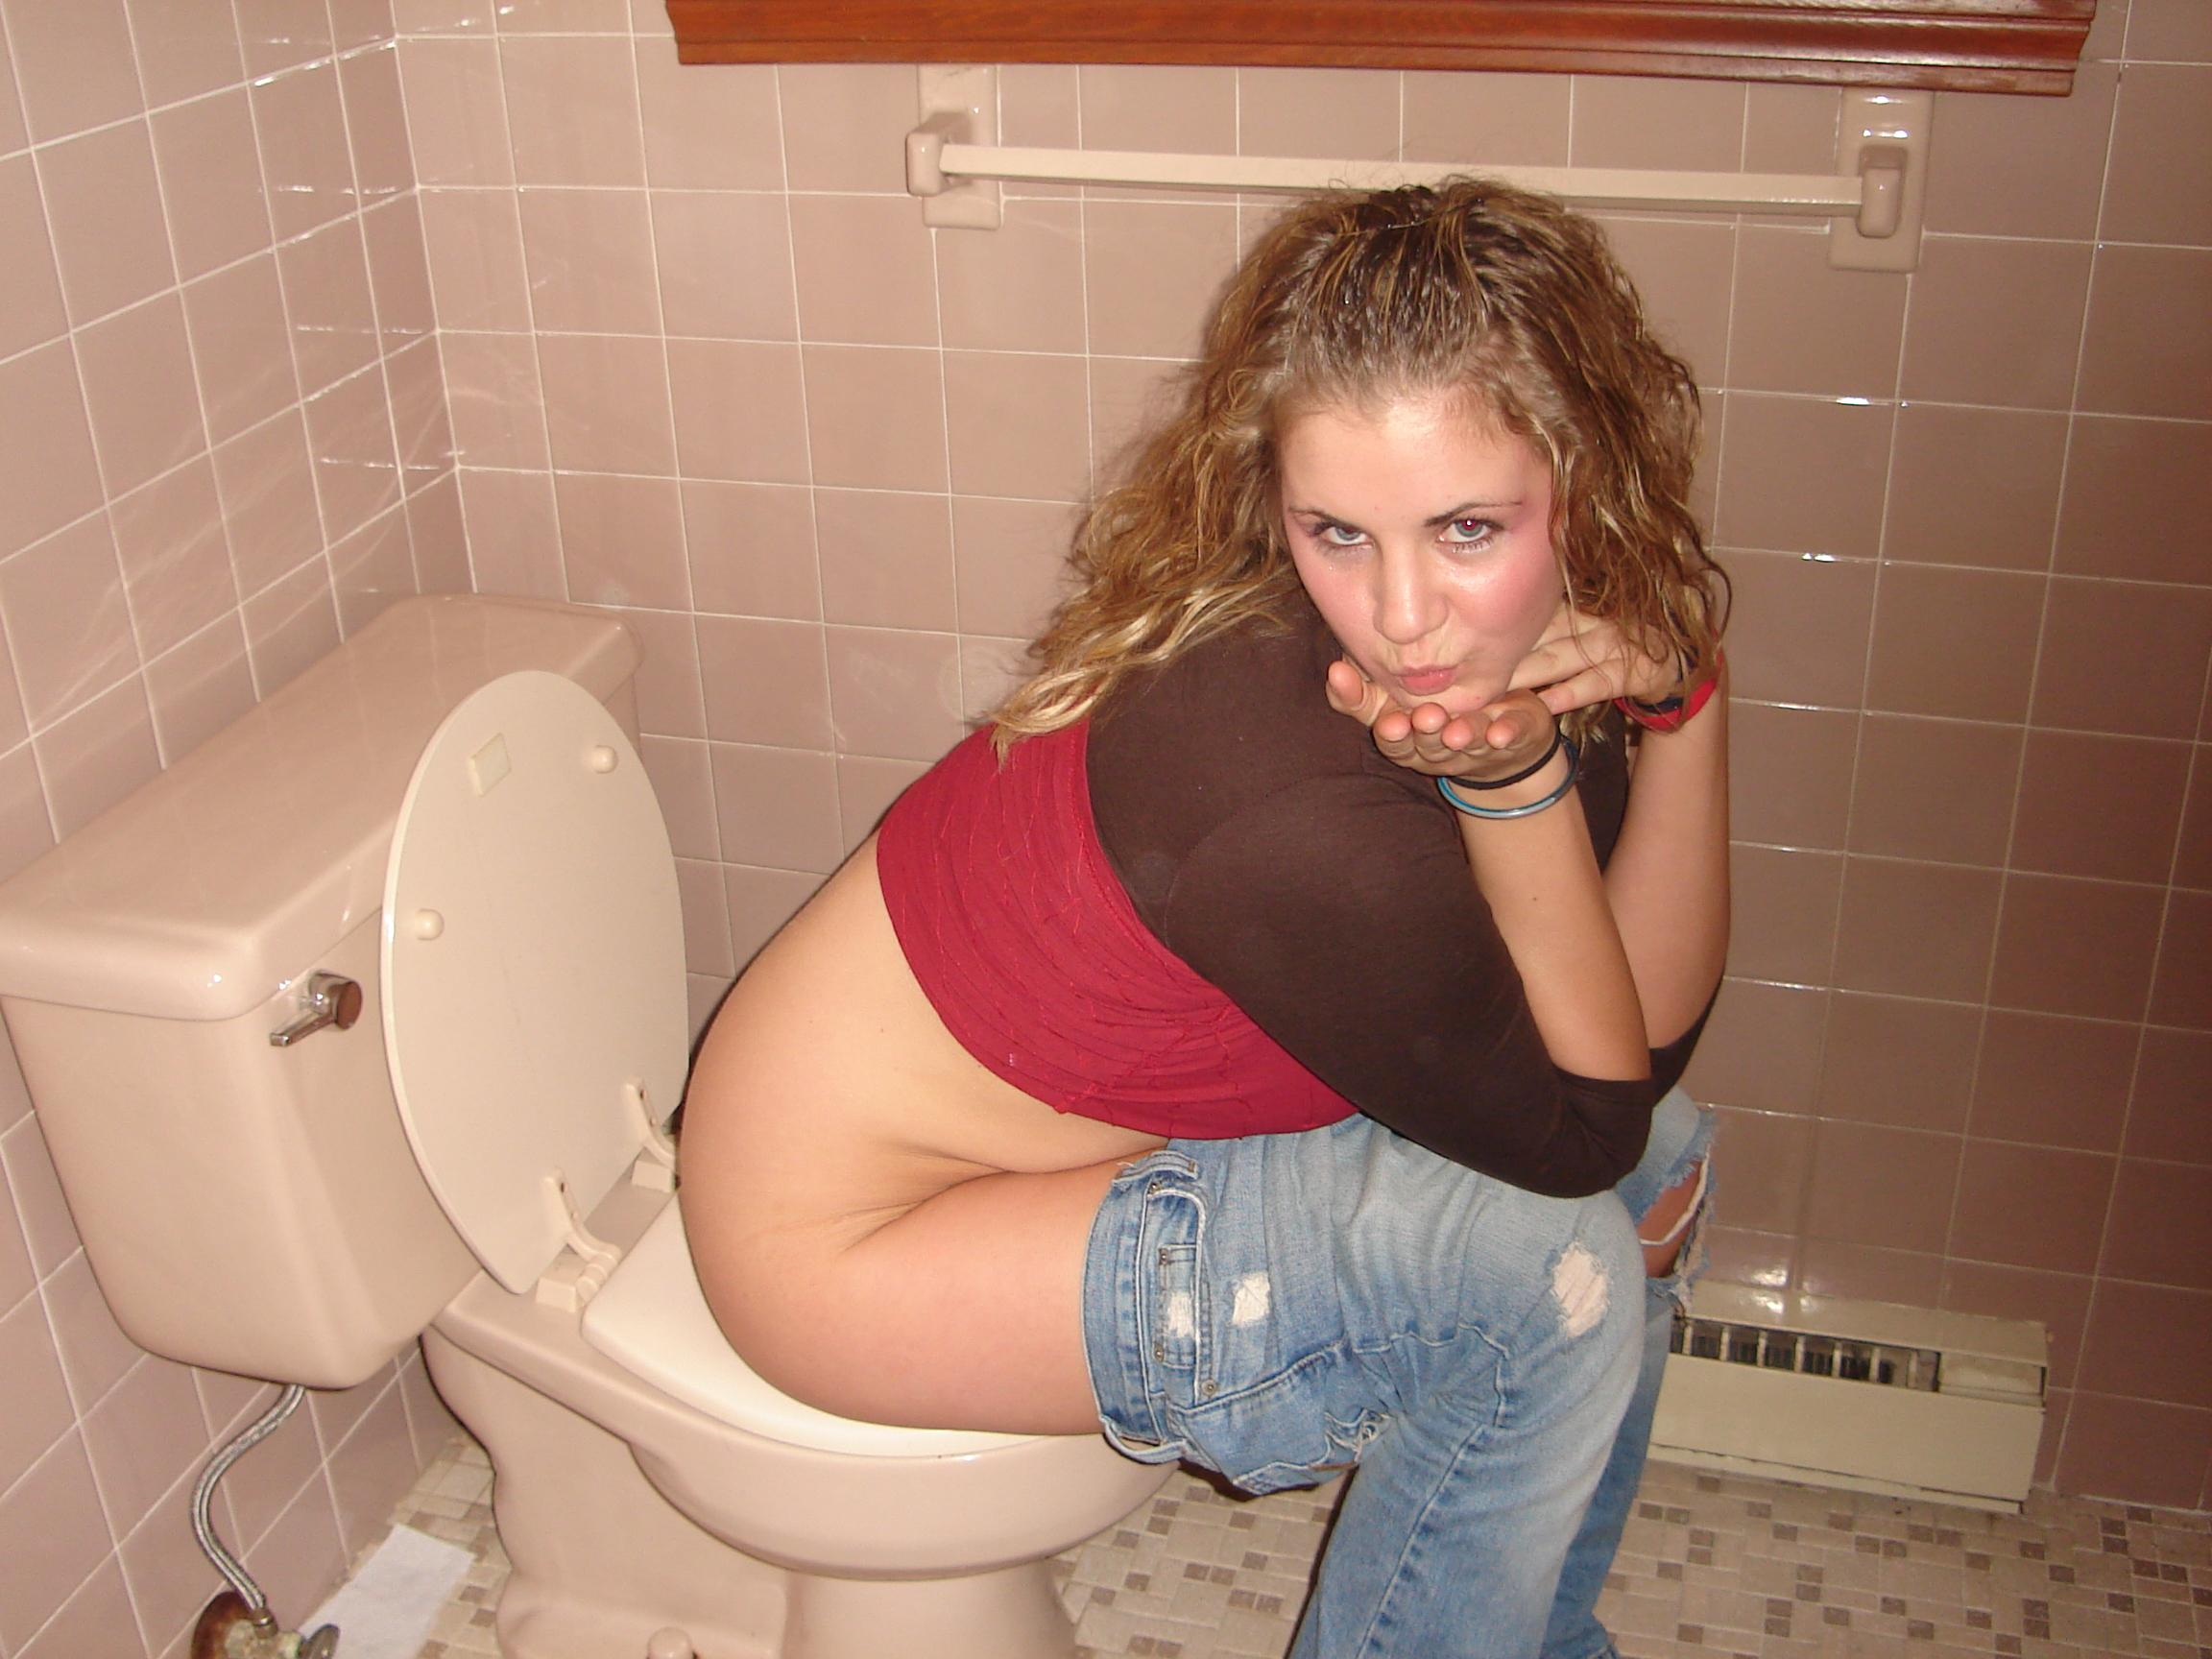 Girl on toilet panties down pussy